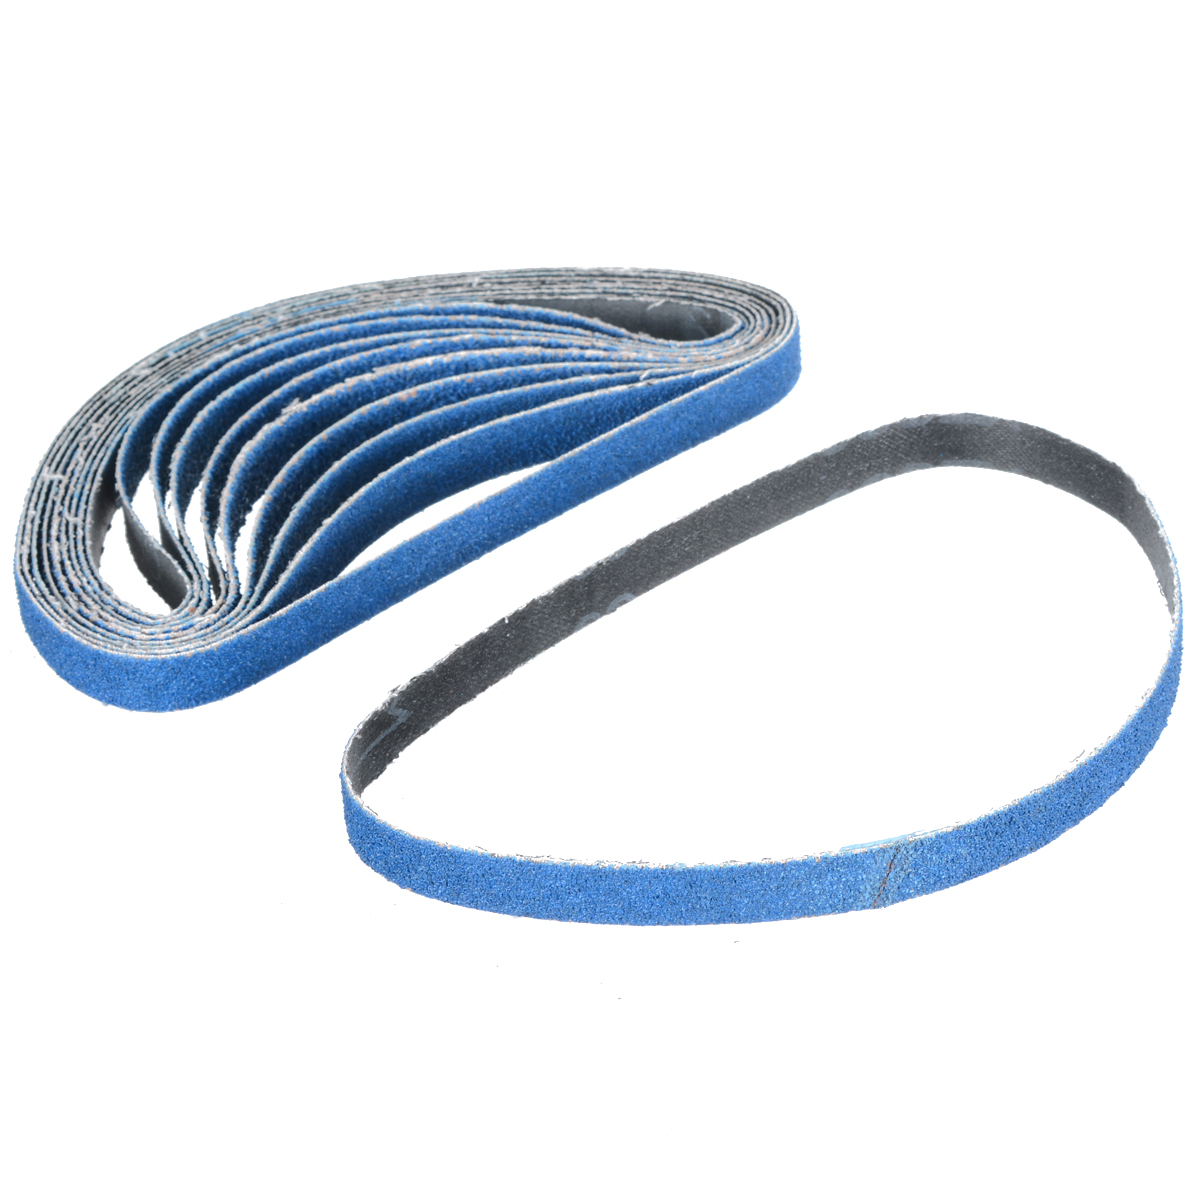 10pcs set Mixed 40 60 80 Grit Zirconia Sanding Belt 13mm 457mm Sander Polishing Abrasive Belt in Abrasive Tools from Tools